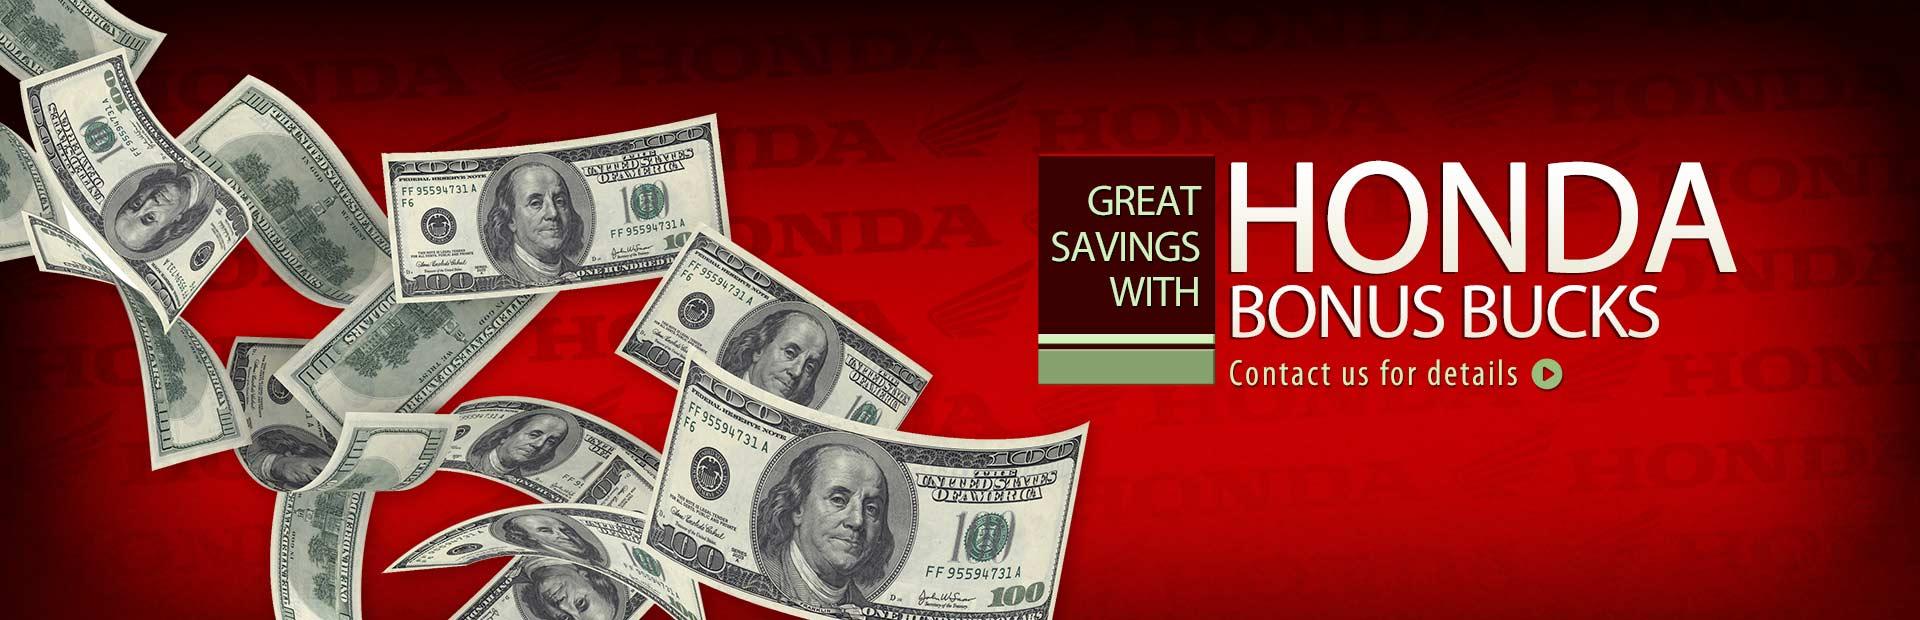 Great savings with Honda Bonus Bucks! Click here to contact us.